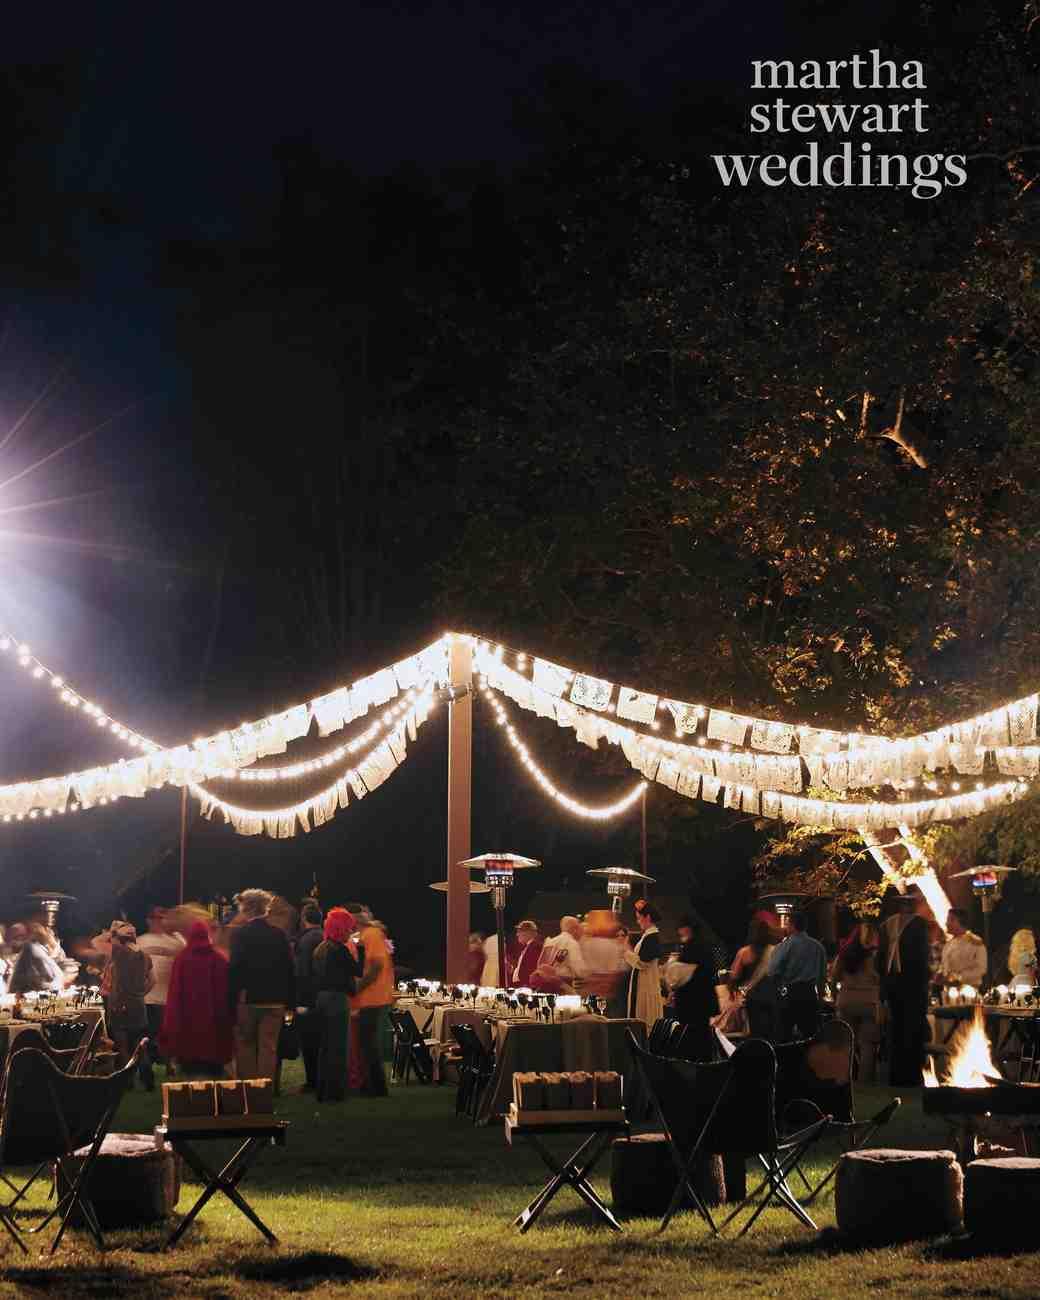 jamie-bryan-wedding-11-costume-party-0739-d112664.jpg